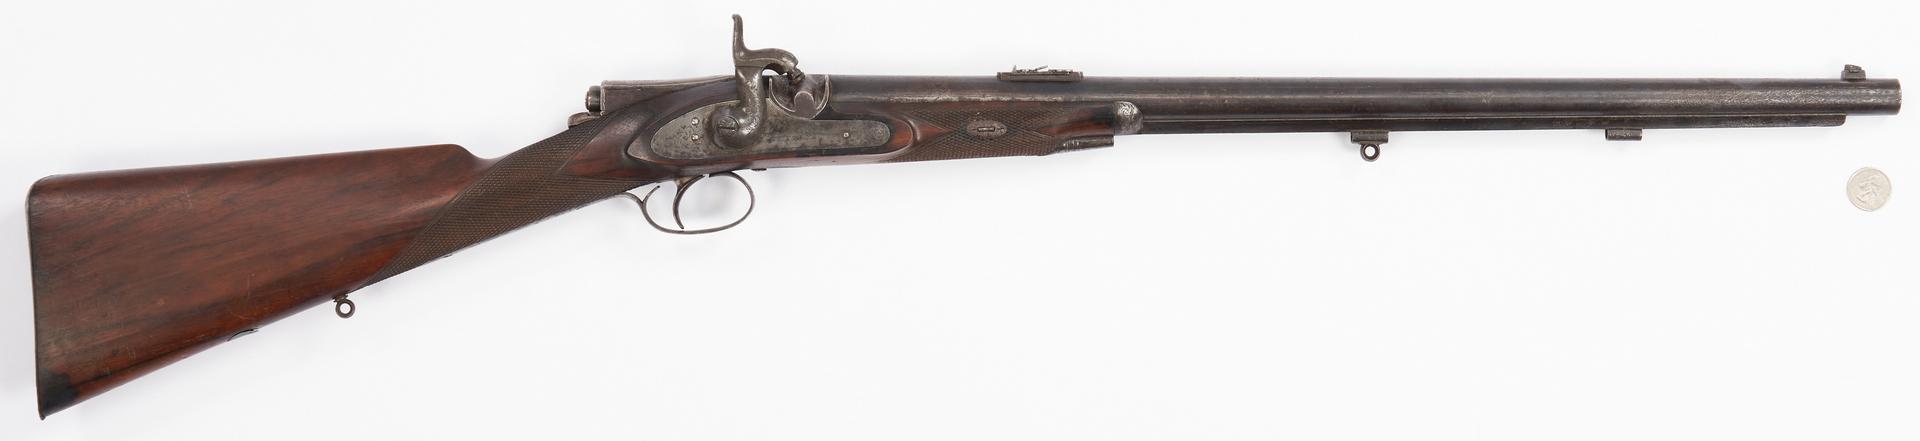 Lot 698: British E.M Reilly & Co. Percussion Carbine, .577 Caliber